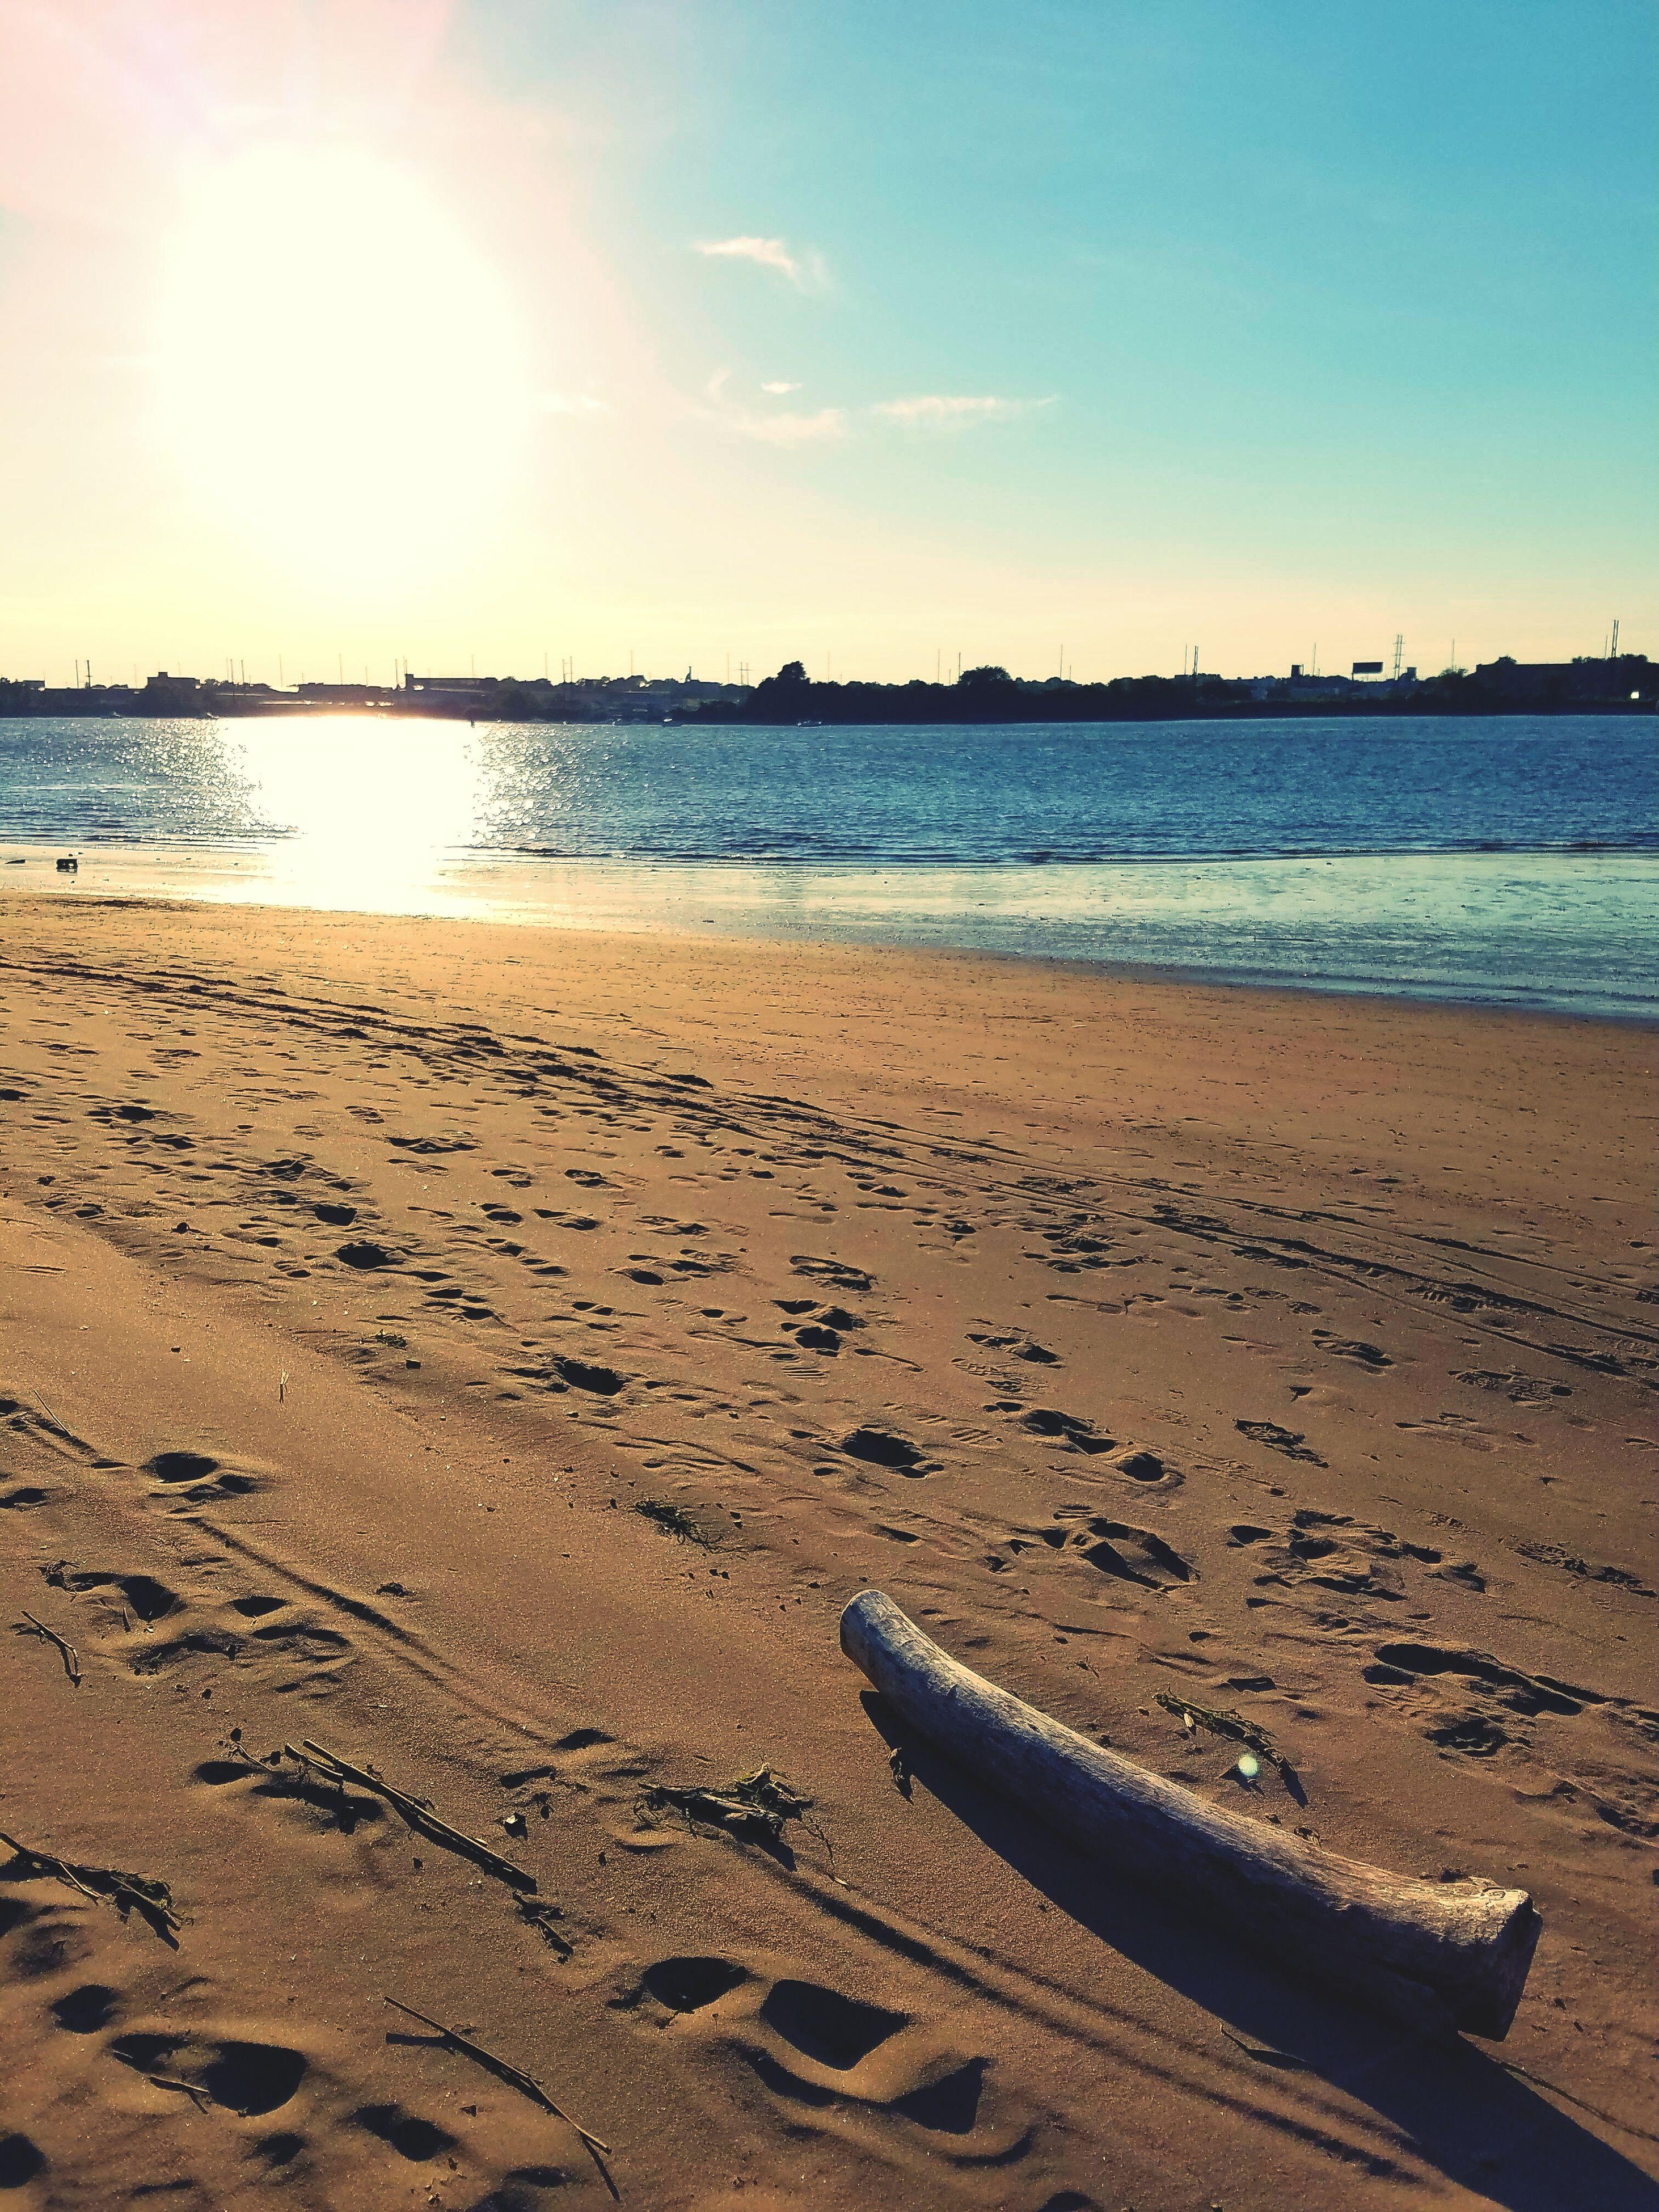 beach, sand, water, sea, shore, sunlight, tranquility, tranquil scene, sky, scenics, nature, beauty in nature, coastline, idyllic, outdoors, sun, travel destinations, no people, sunny, non-urban scene, remote, day, sunbeam, tourism